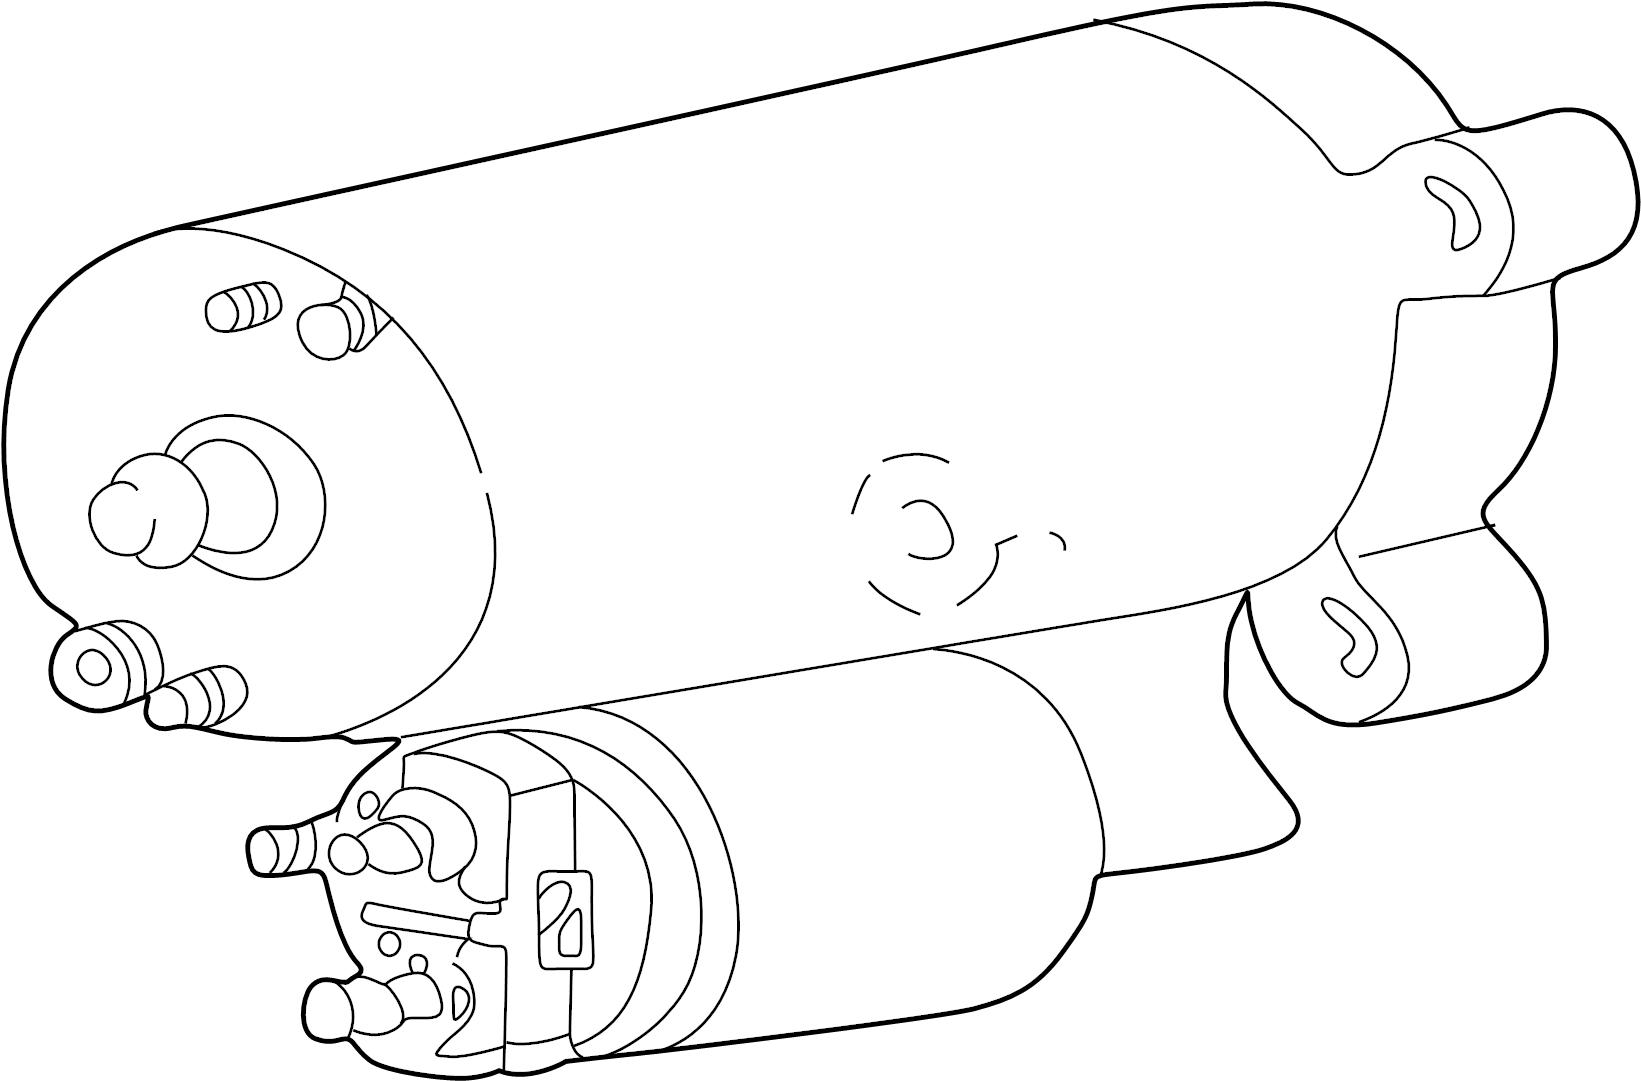 Ford Contour Starter Motor. Auto, Trans, Liter